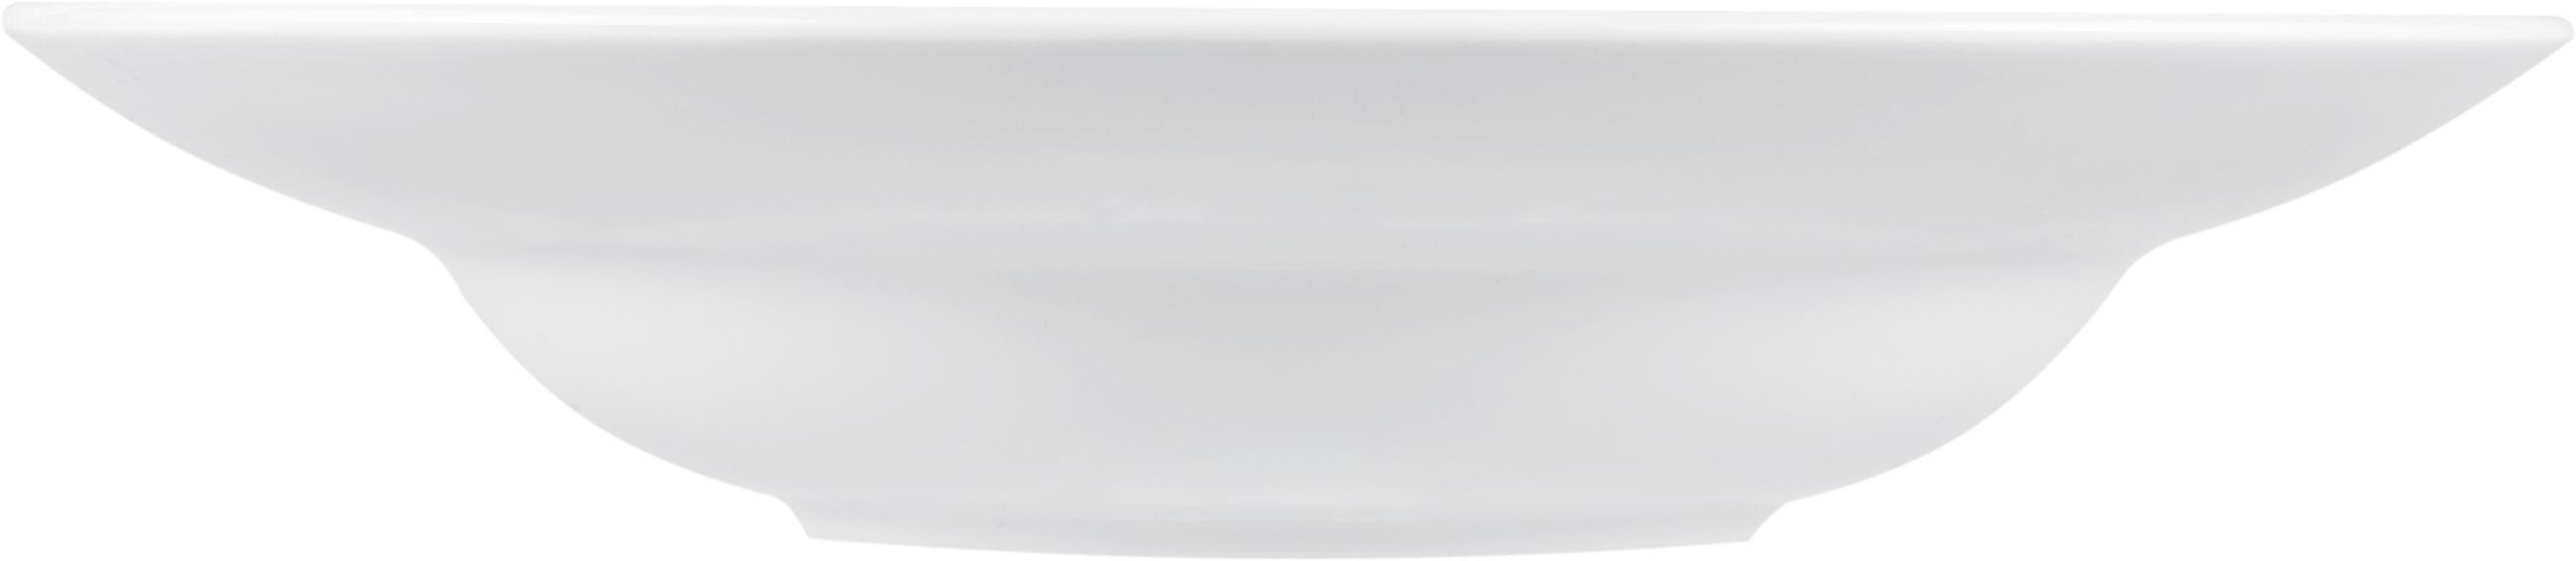 Pastateller Vivo New Fresh 2-er Set - Weiß, KONVENTIONELL, Keramik (31cm) - VIVO